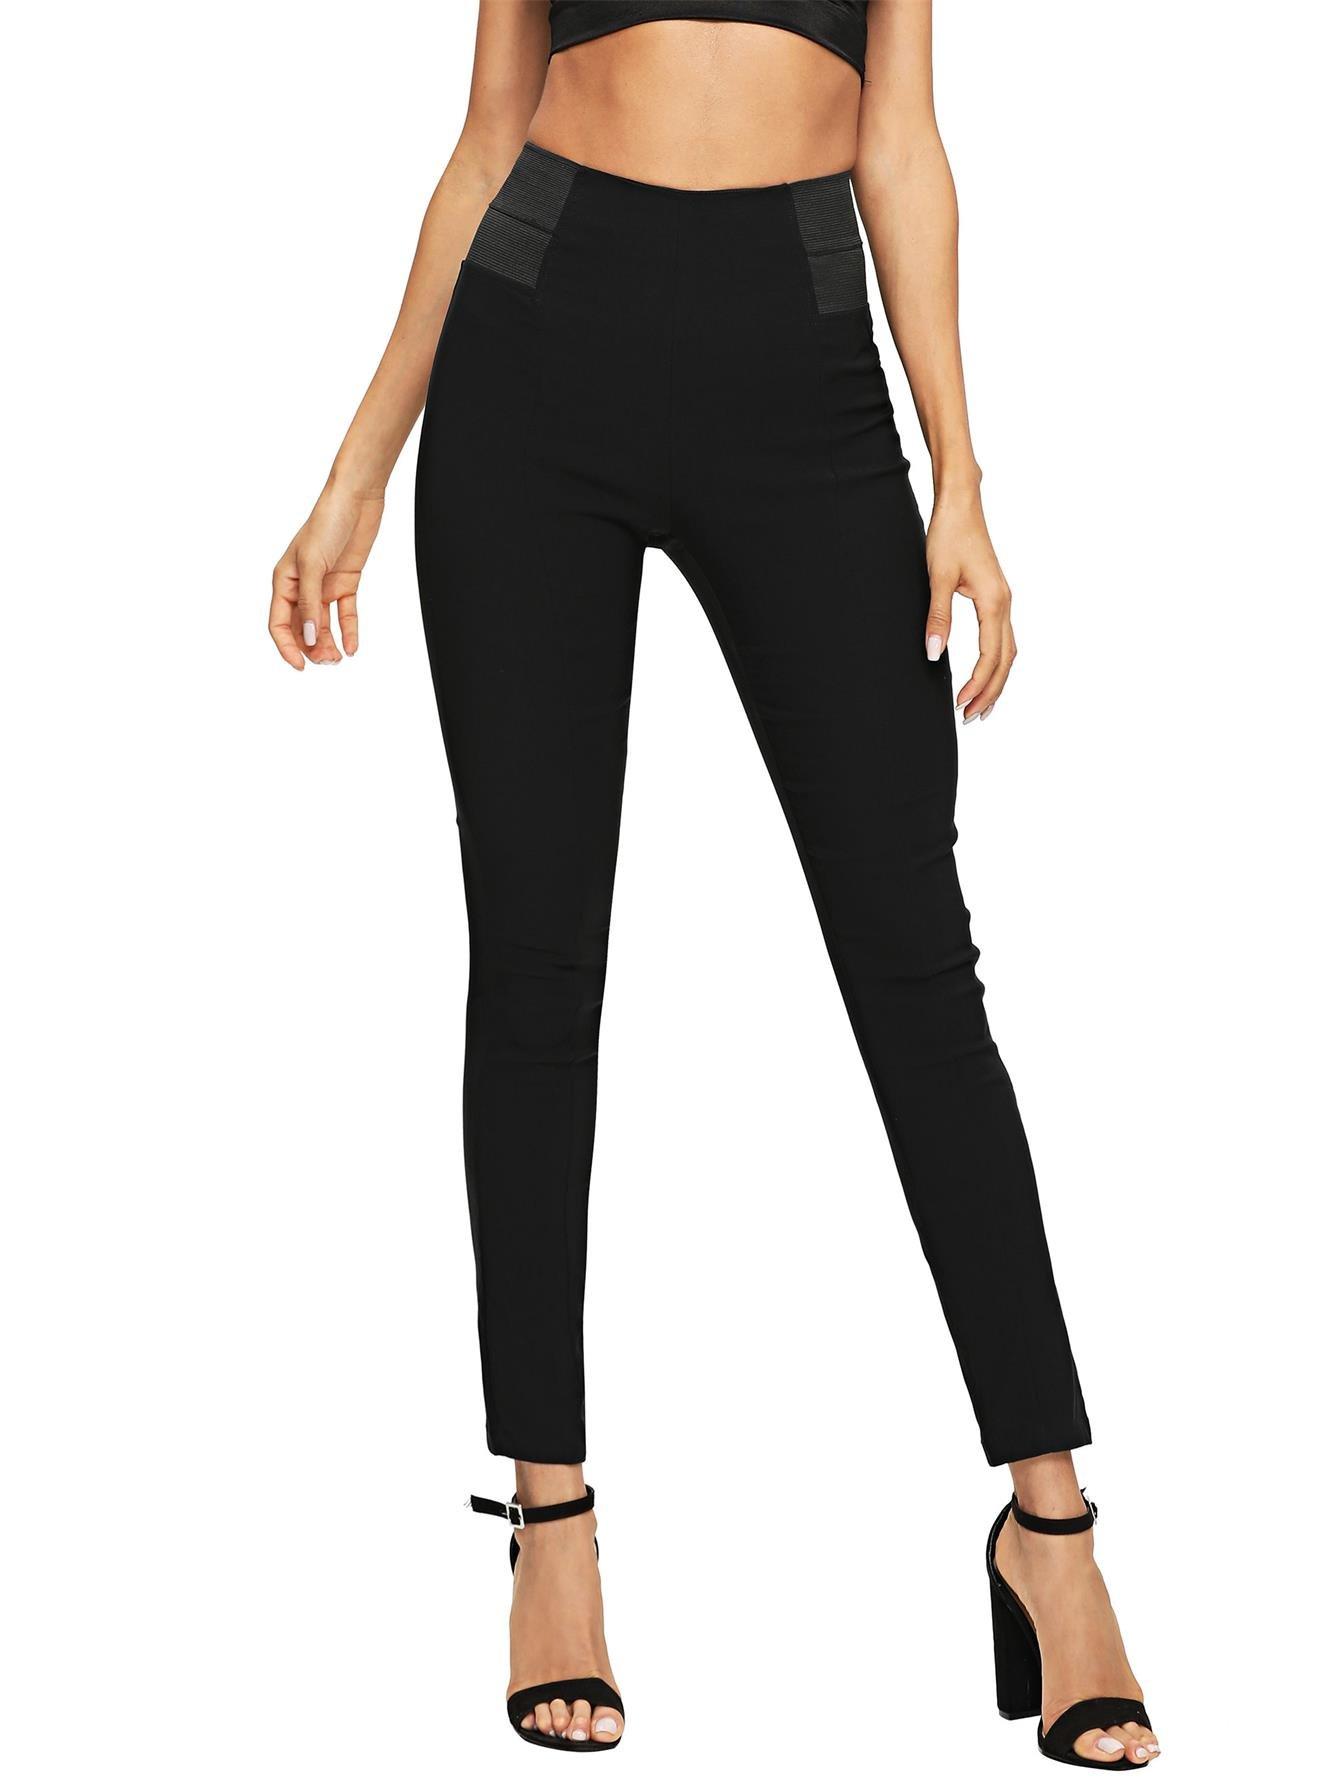 SweatyRocks Women's Casual Plaid Leggings Stretchy Work Pants Black #4 M